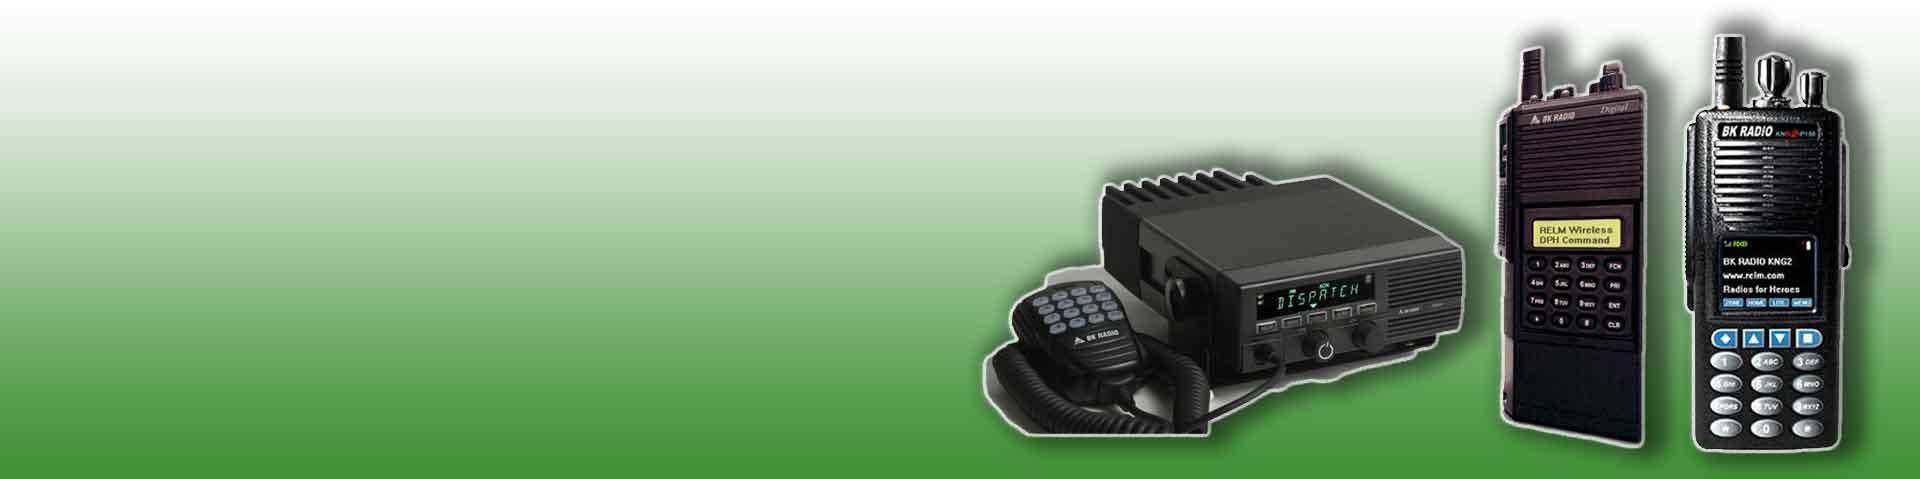 complete wireless technology bendix-king radio repair